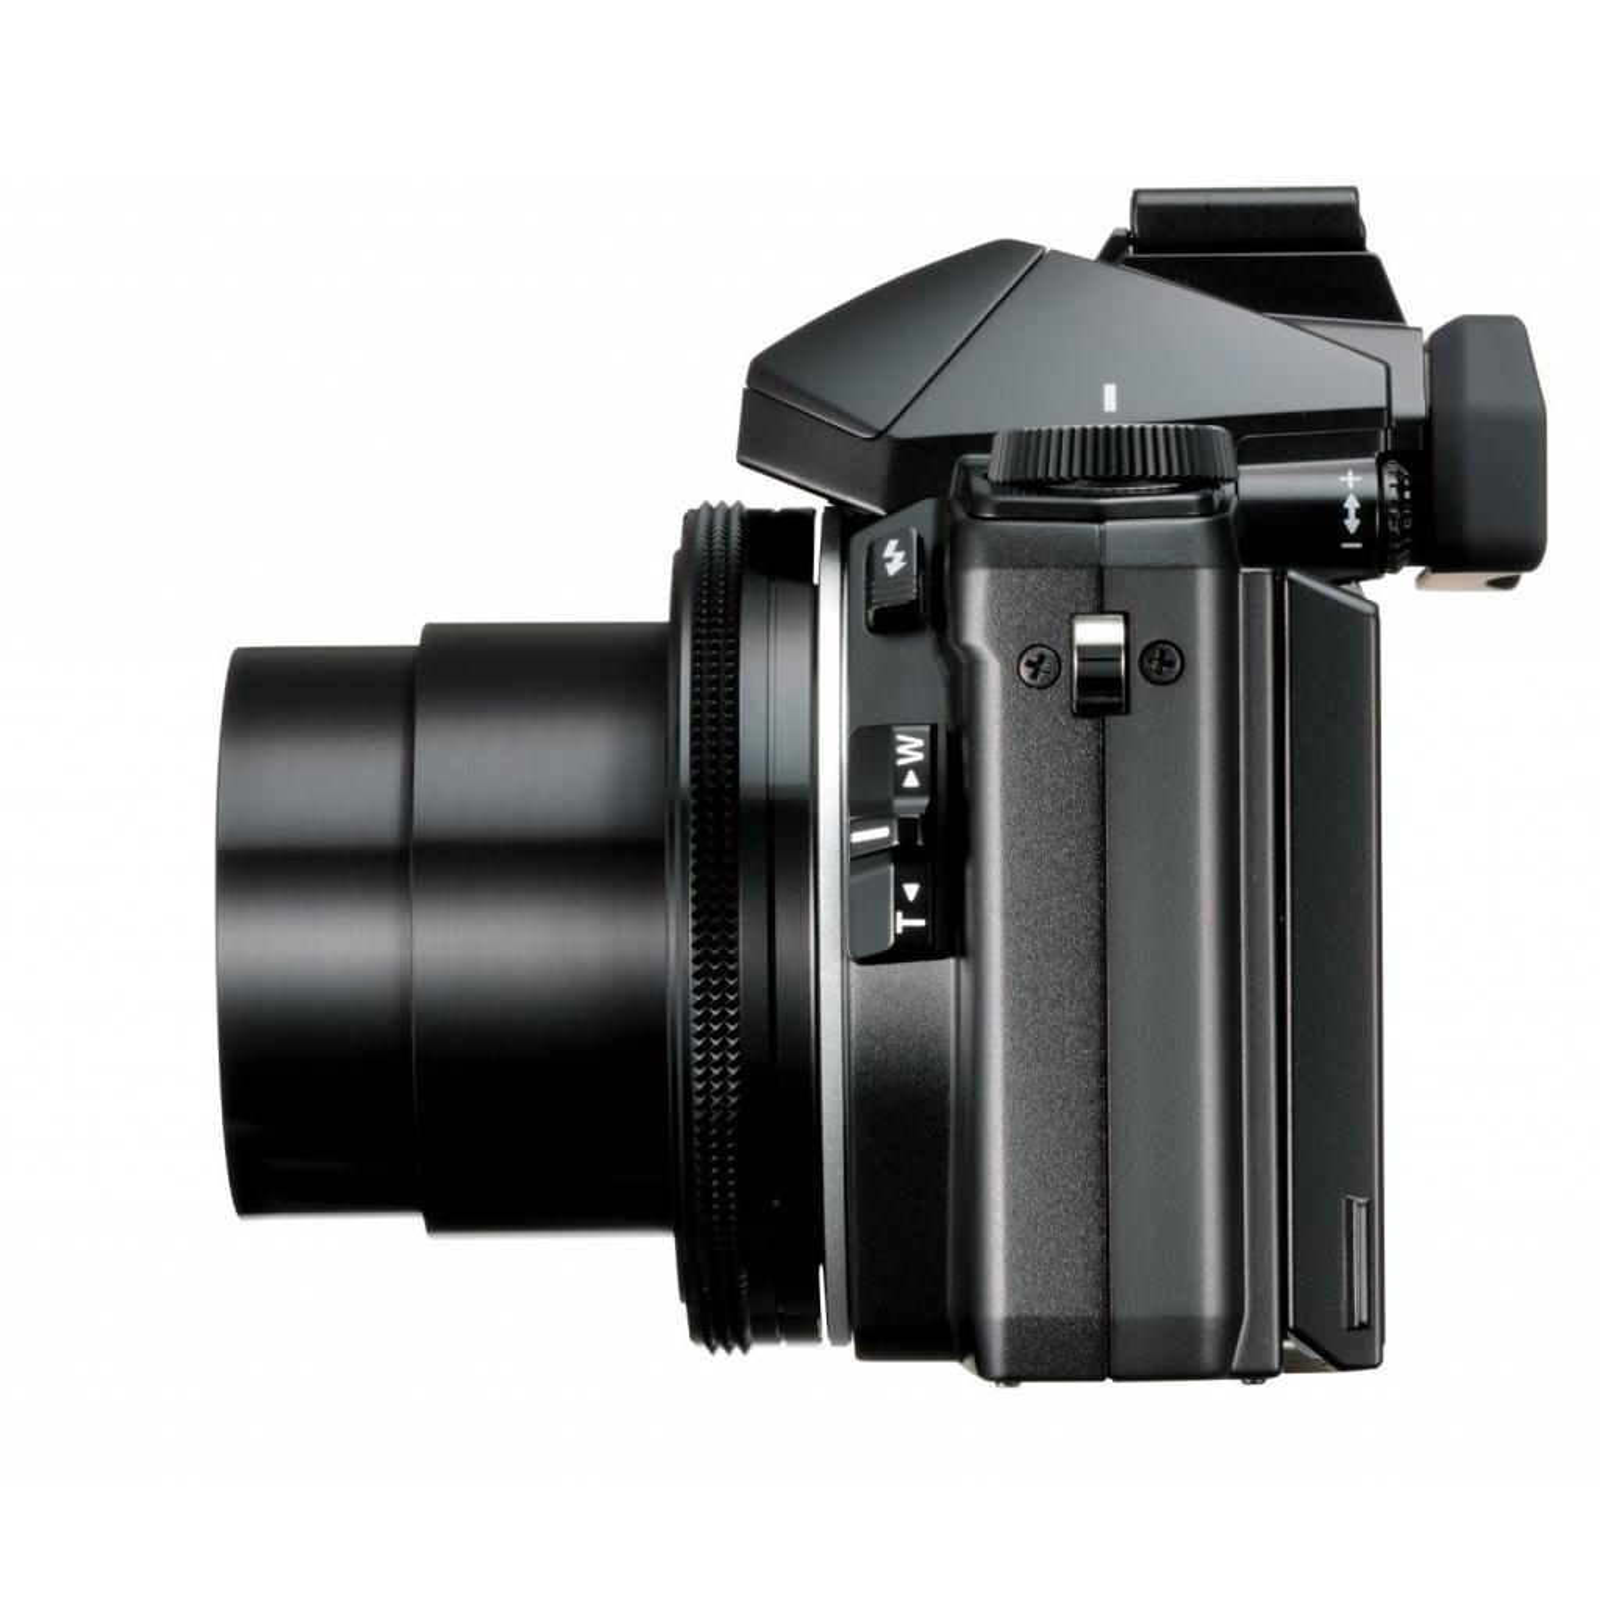 Цифровой фотоаппарат OLYMPUS STYLUS 1 Black (V109010BE000) изображение 8